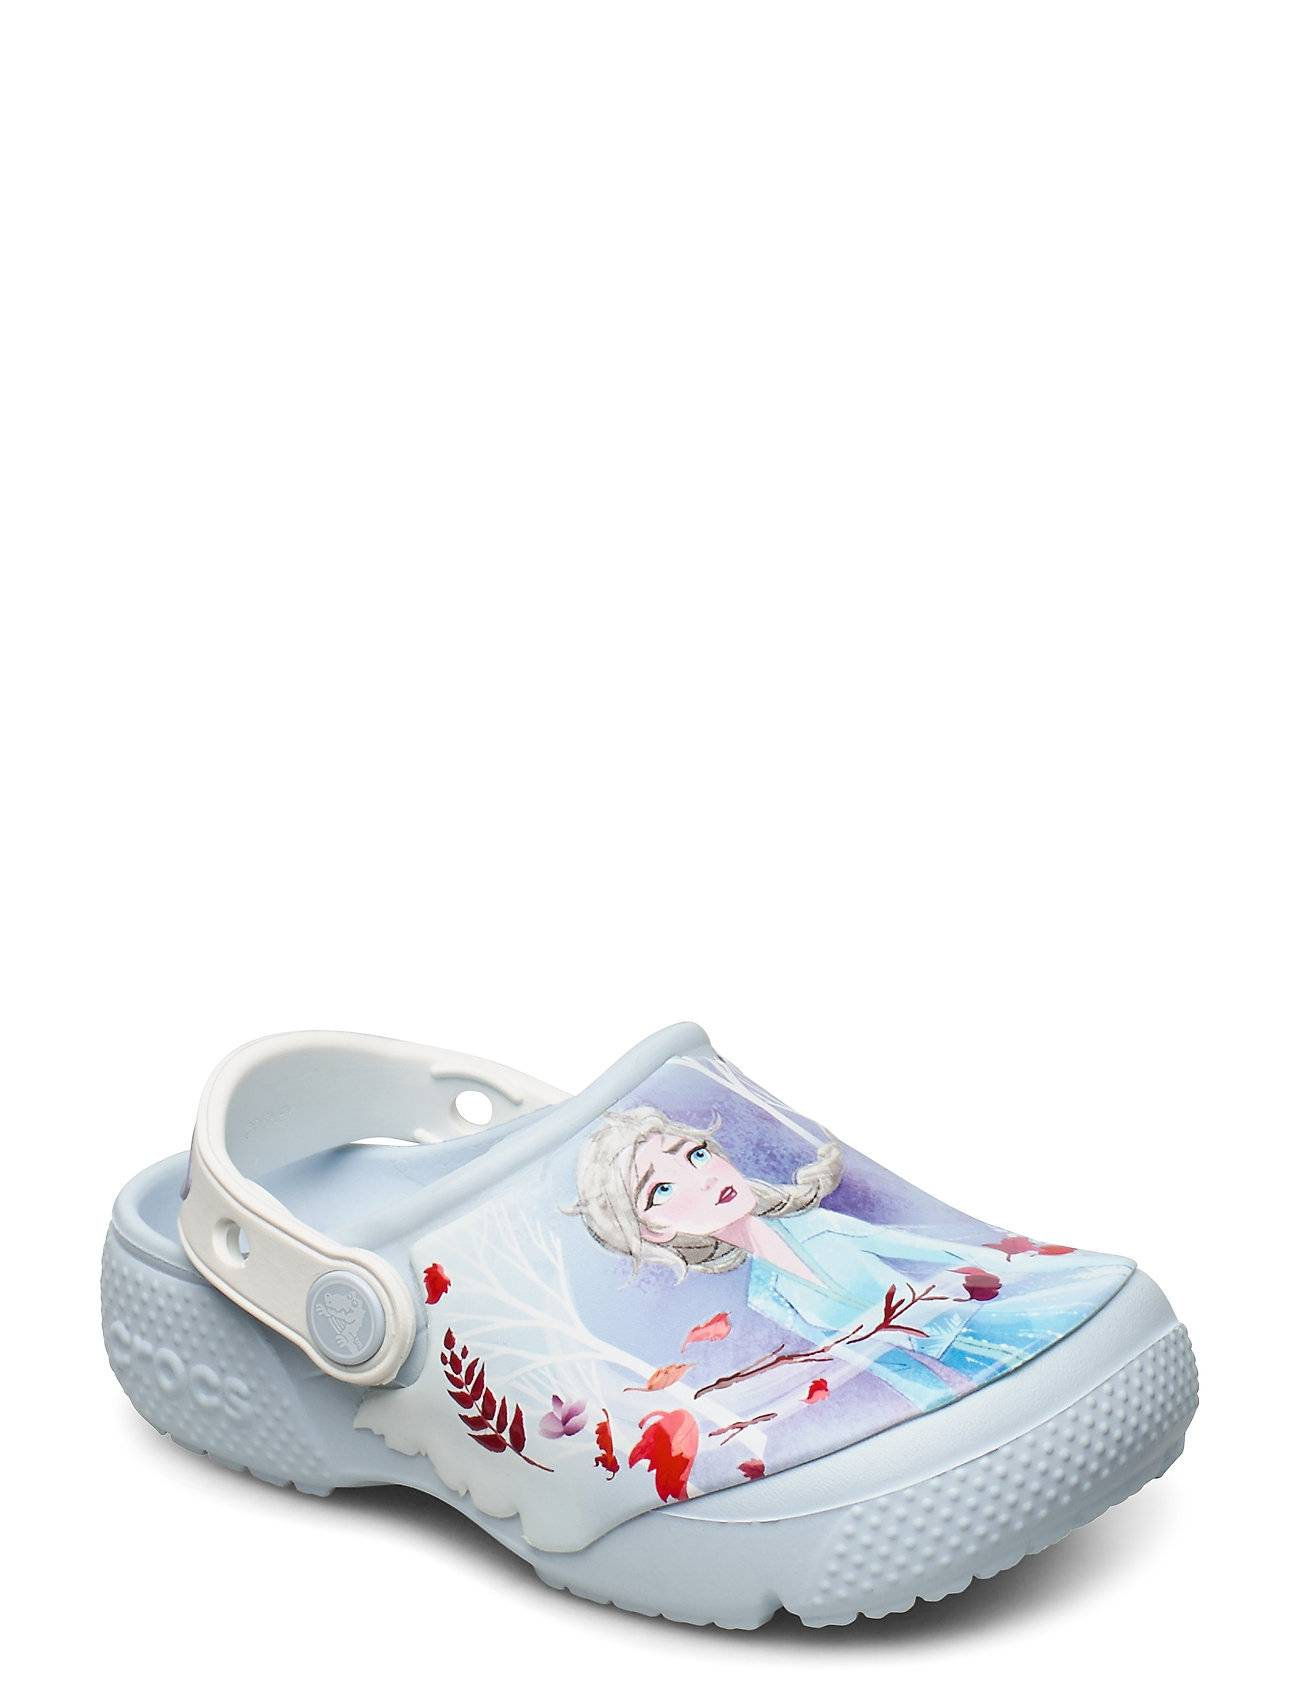 Crocs Fl Disney Frozen 2 Clg K Shoes Crocs Valkoinen Crocs